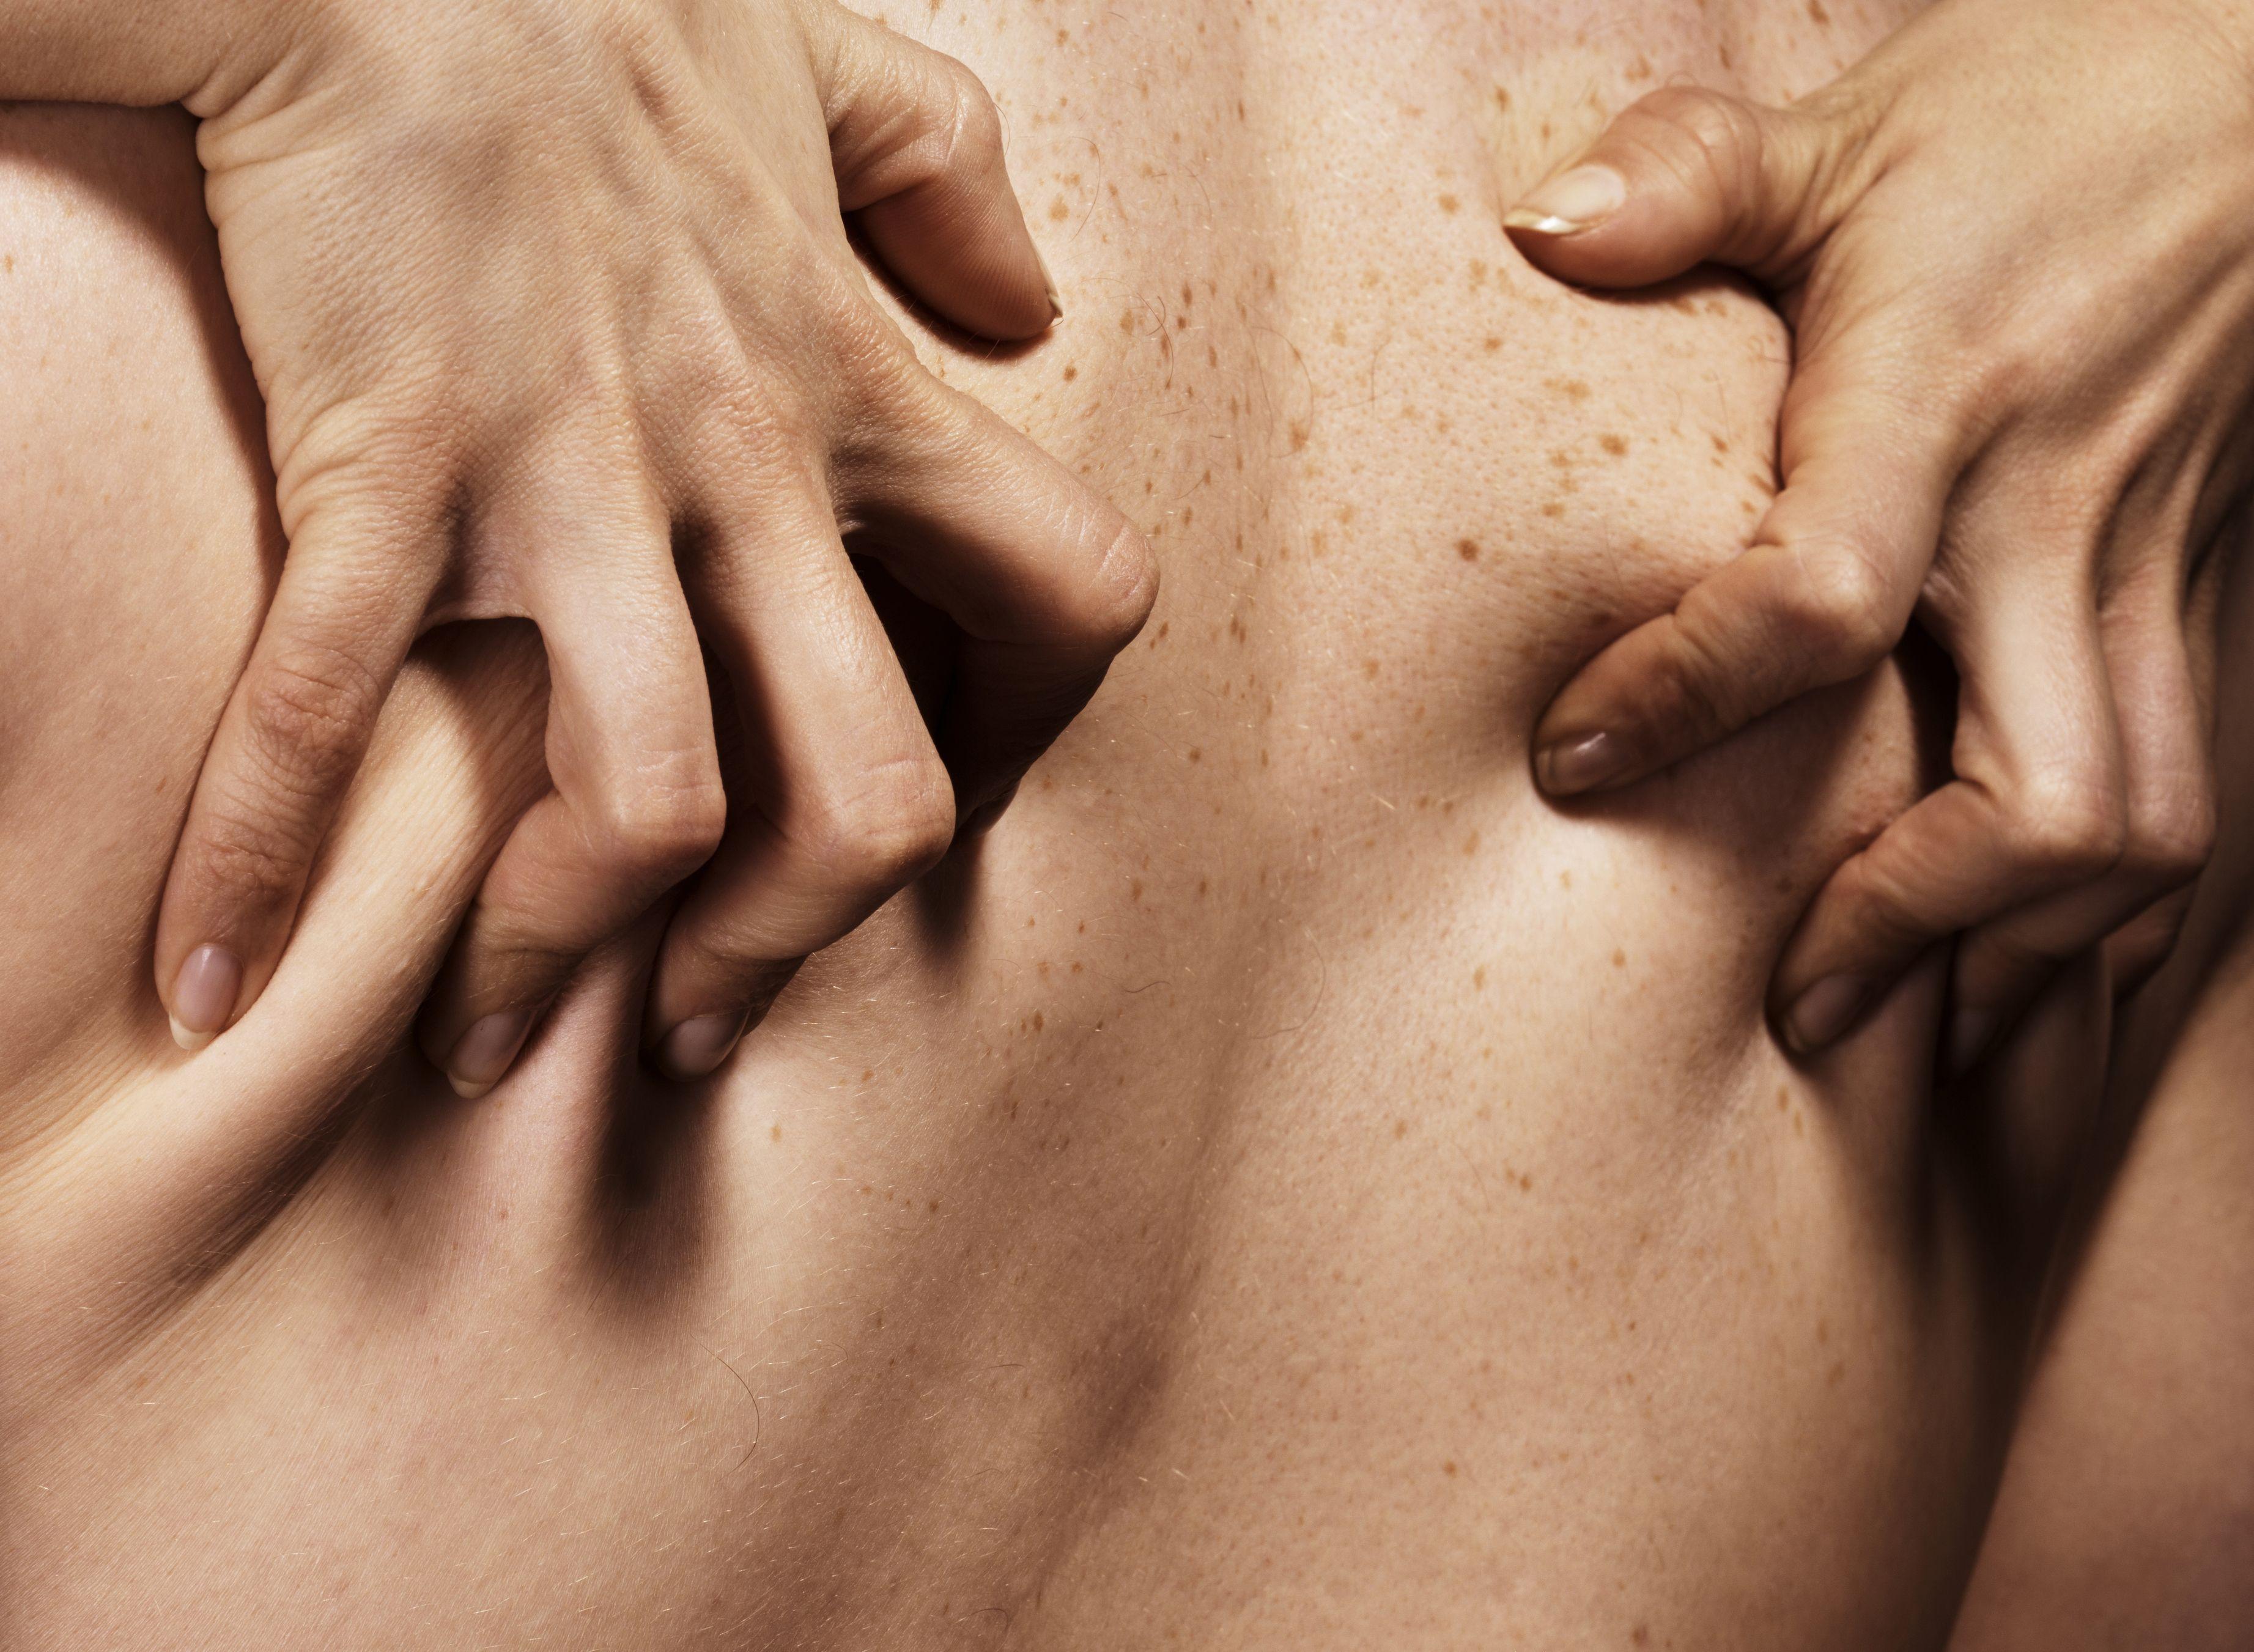 Skin vulva tear irritated skin